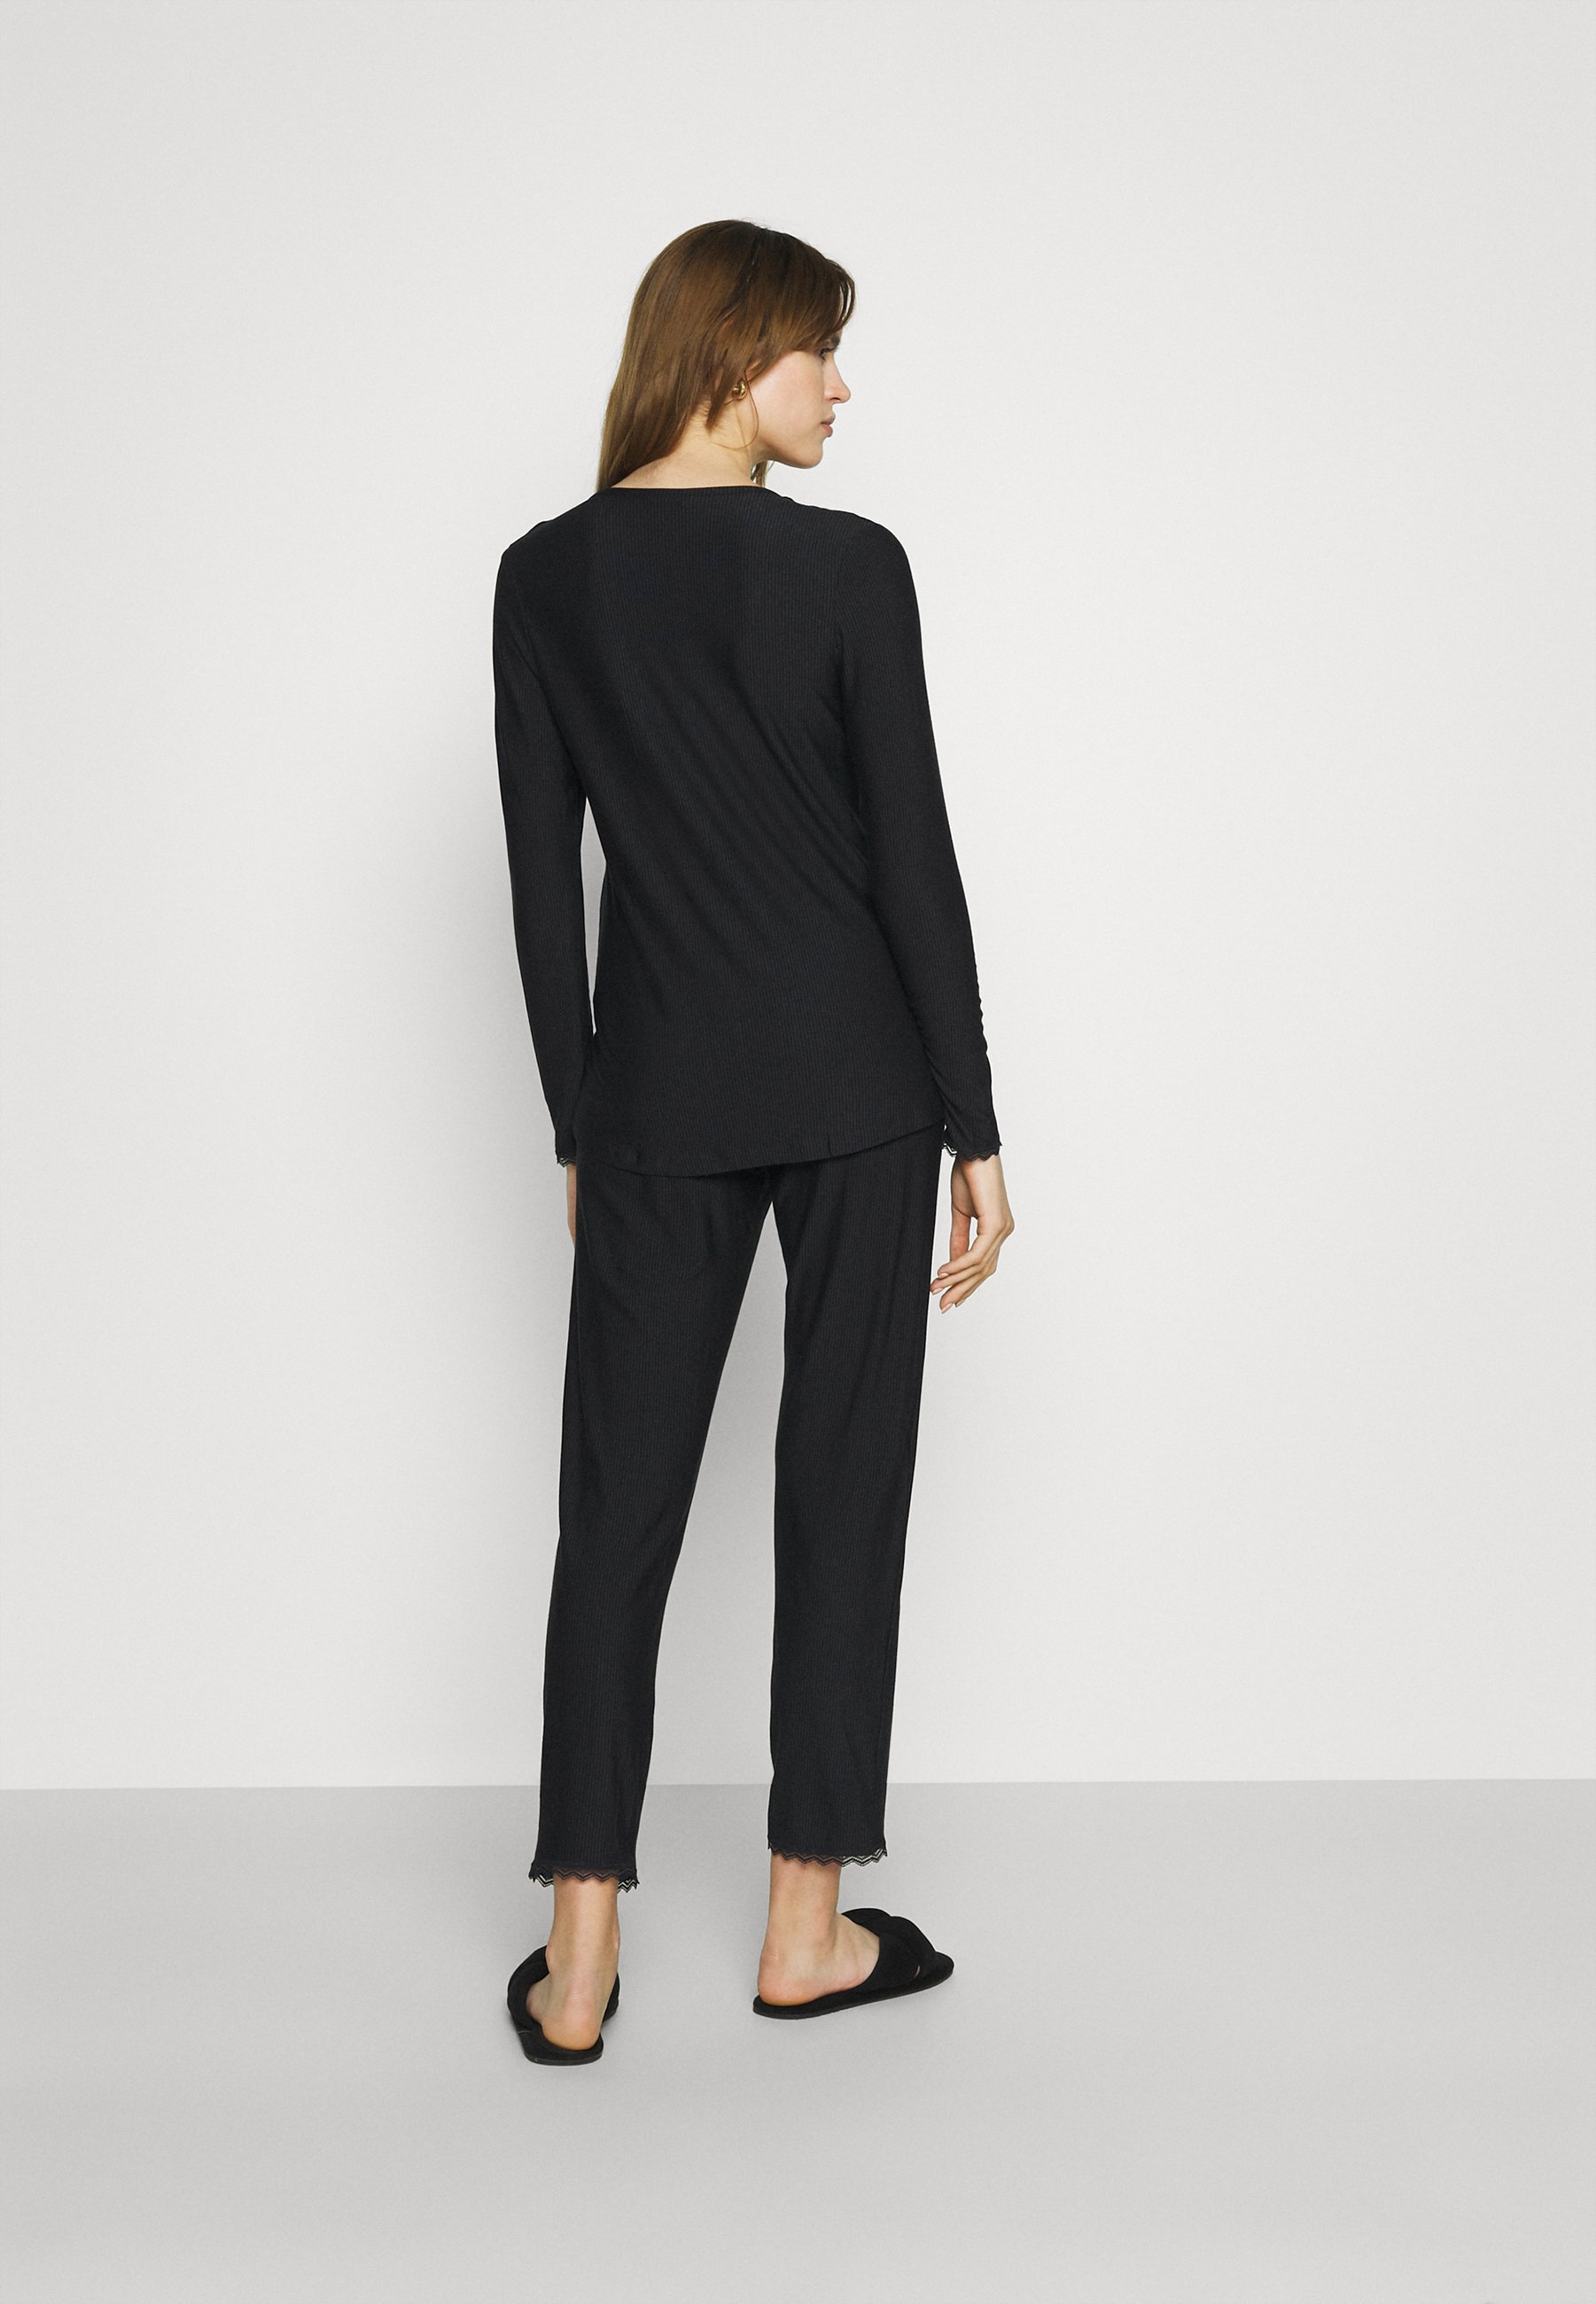 Damen SOFT STRIPES LONGSLEEVE LONG PANTS - Pyjama